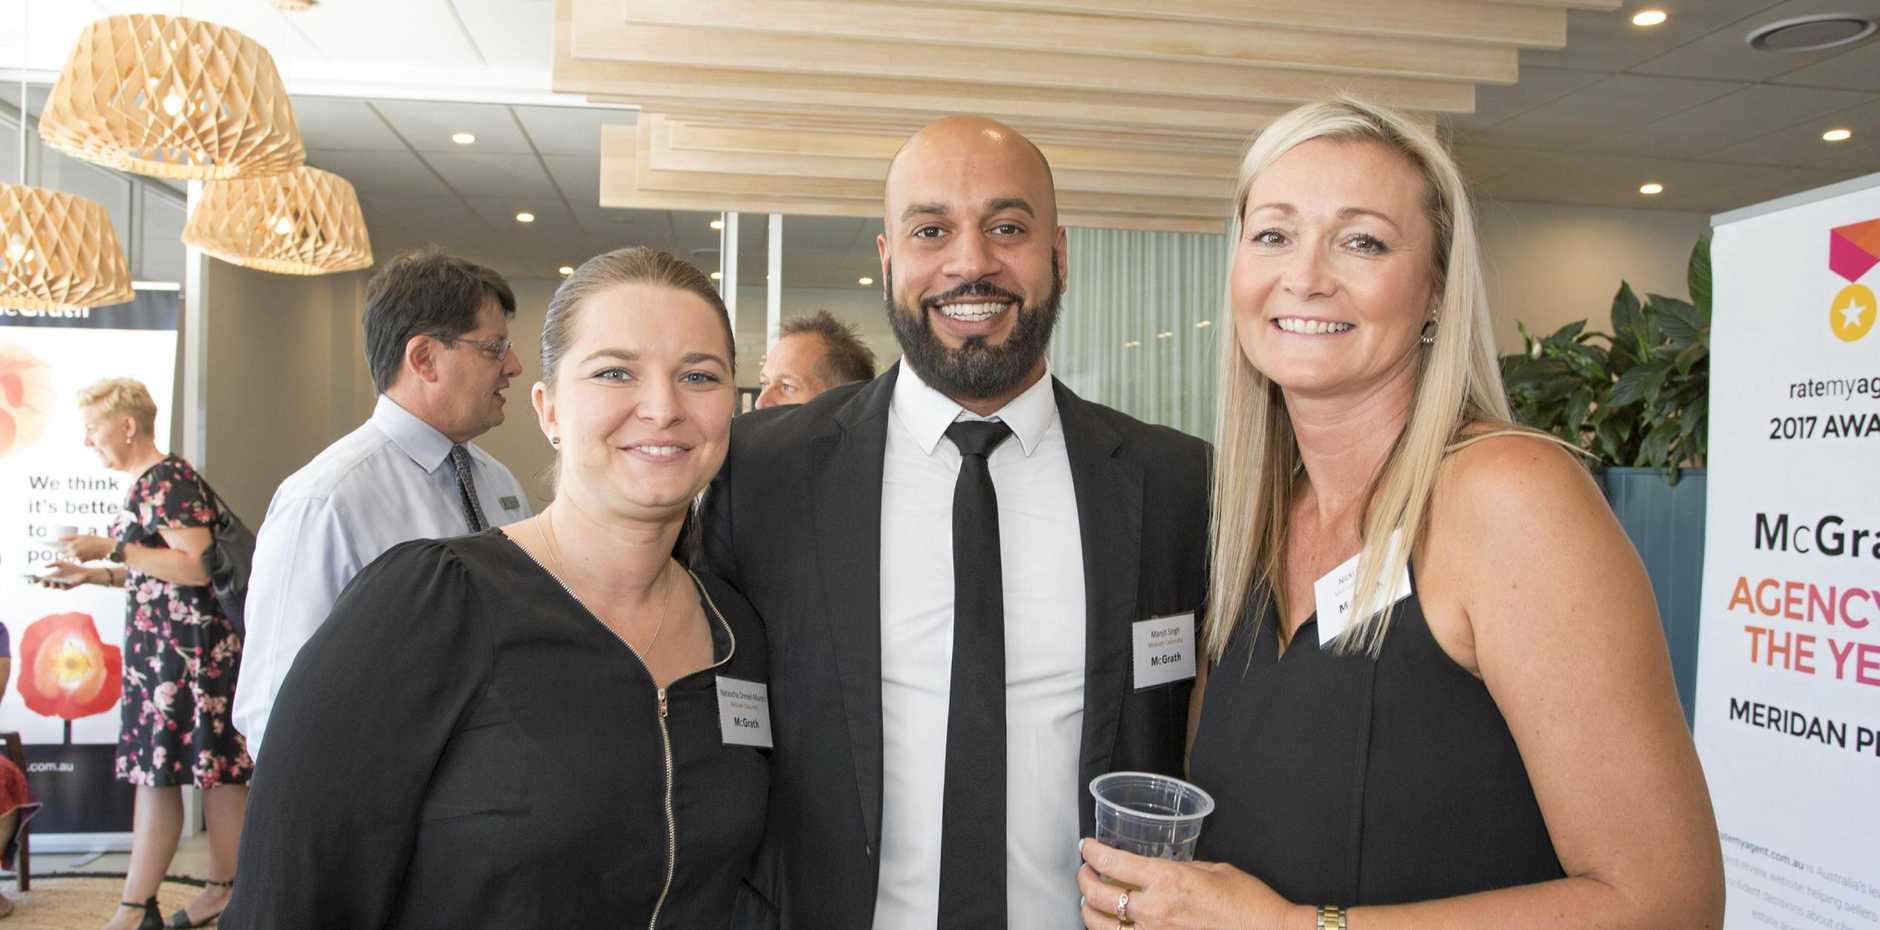 CHARITABLE BUSINESS: Natascha Drexel-Munro, Manjit Singh and Nicki Colam at the McGrath charity morning tea.